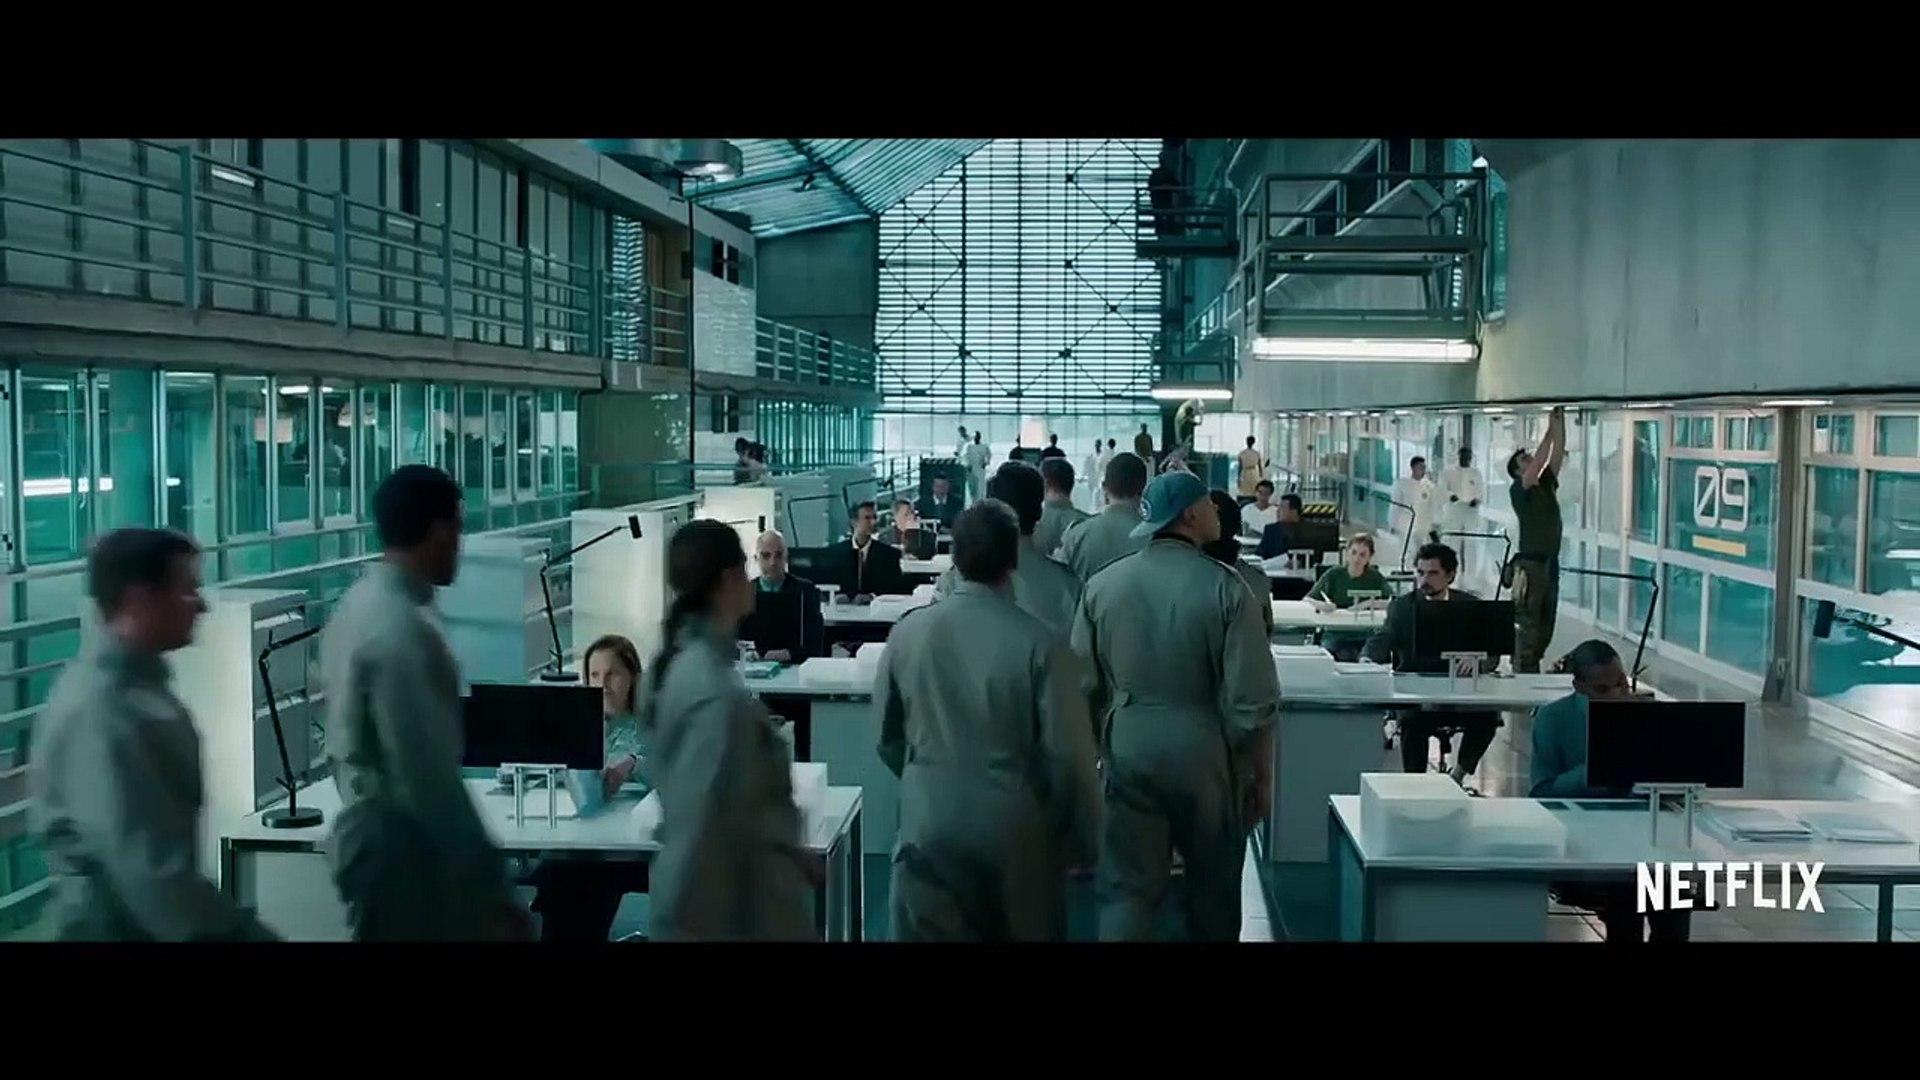 The Titan Trailer #1 (2018) - Movieclips Trailers